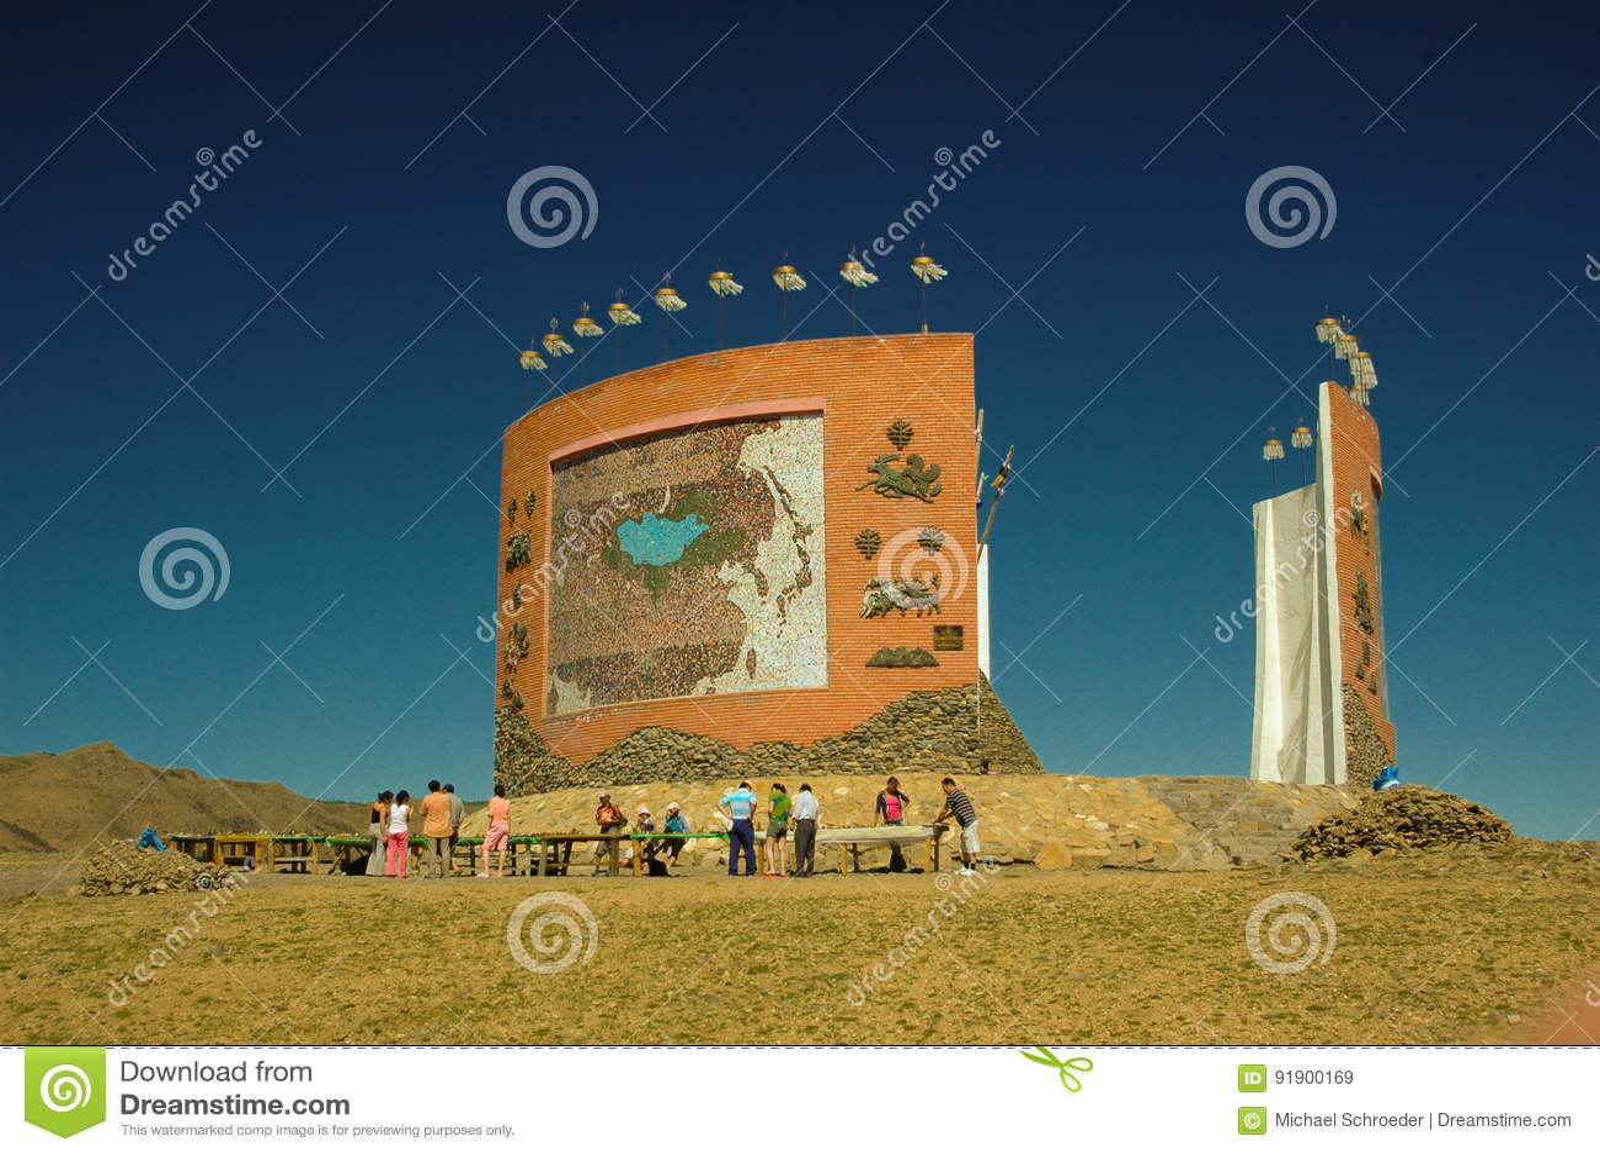 monument-to-memory-genghis-khan-karakoru